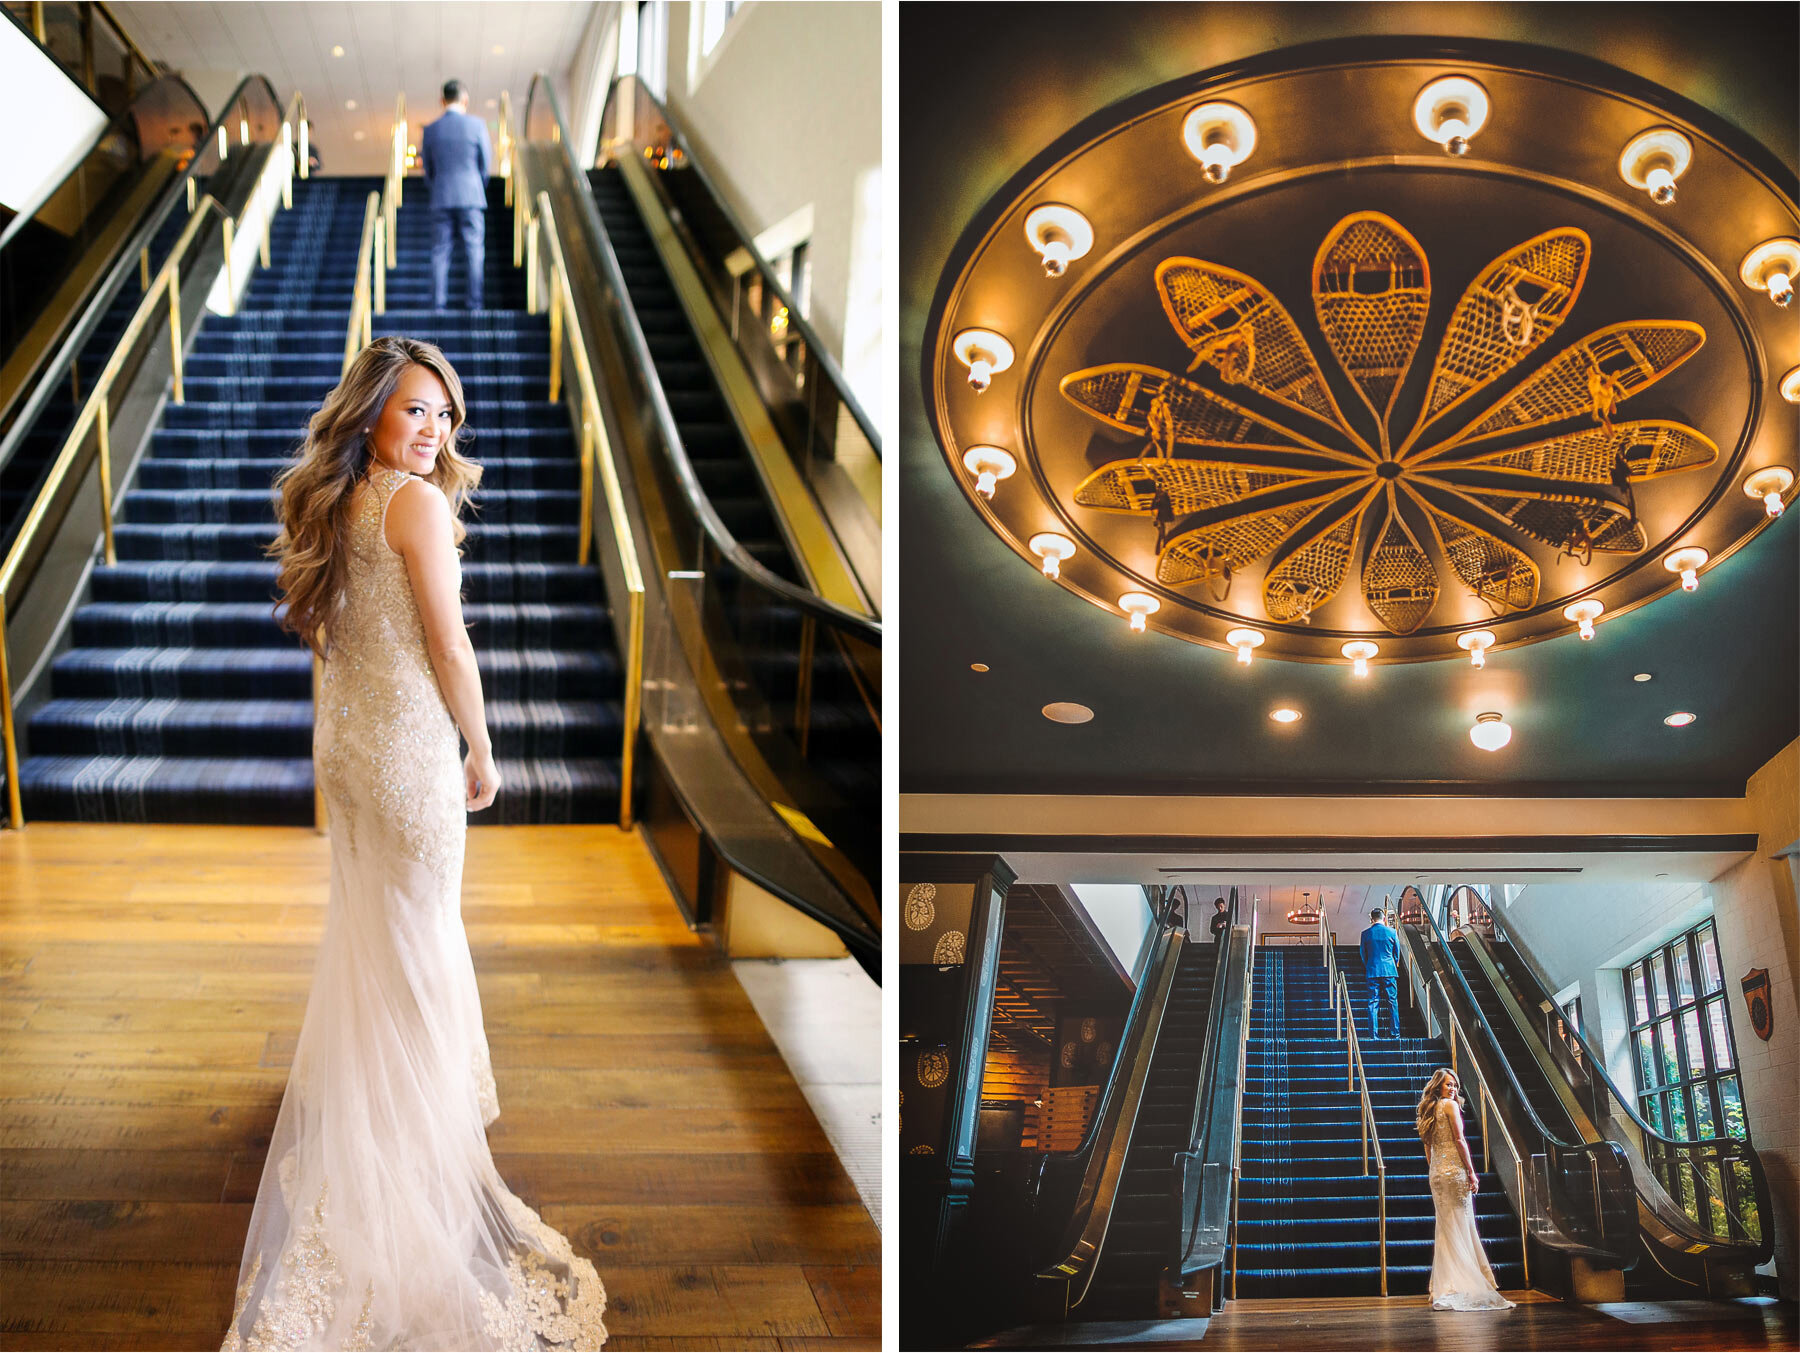 02-Vick-Photography-Minneapolis-Minnesota-The-Graduate-Lobby-Hotel-Bride-First-Look-Mai-&-Ross.jpg